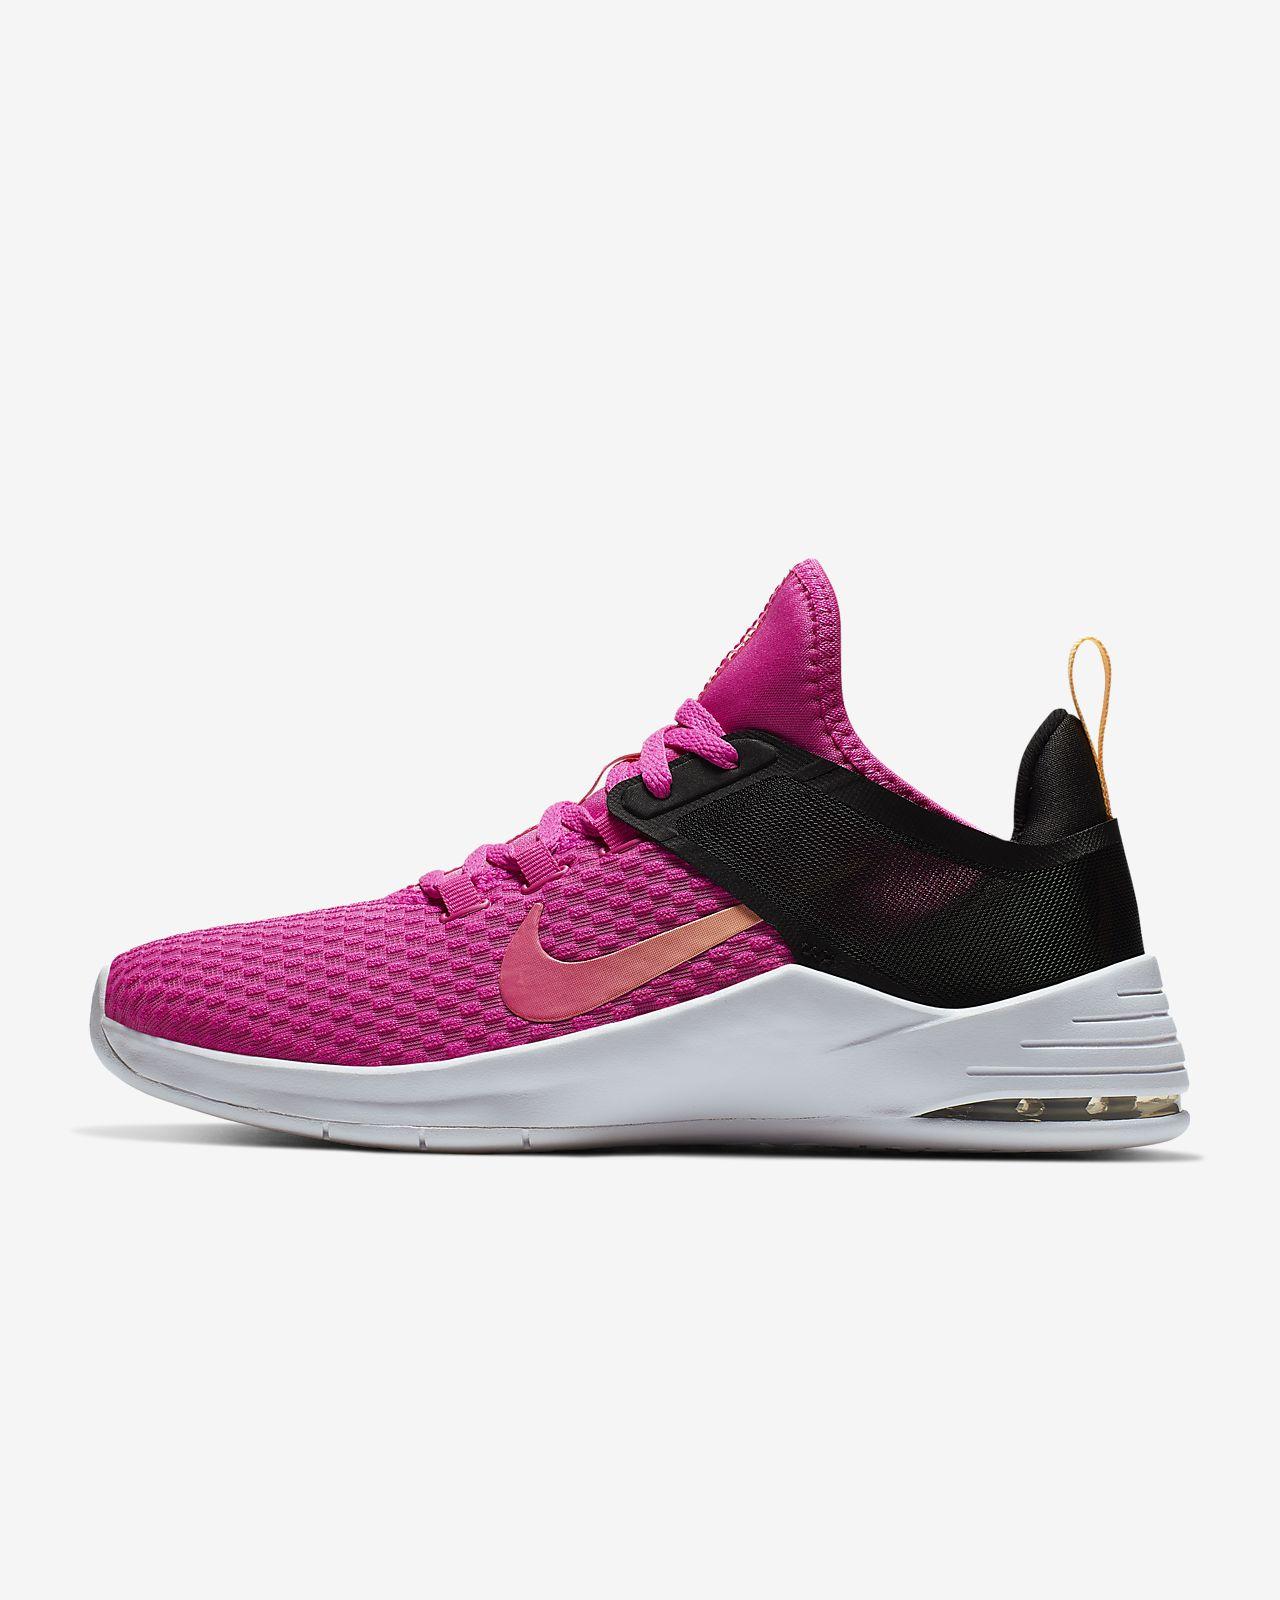 Tr De Air Max 2 Training Bella Pour Femme Nike Chaussure 0OPkw8n